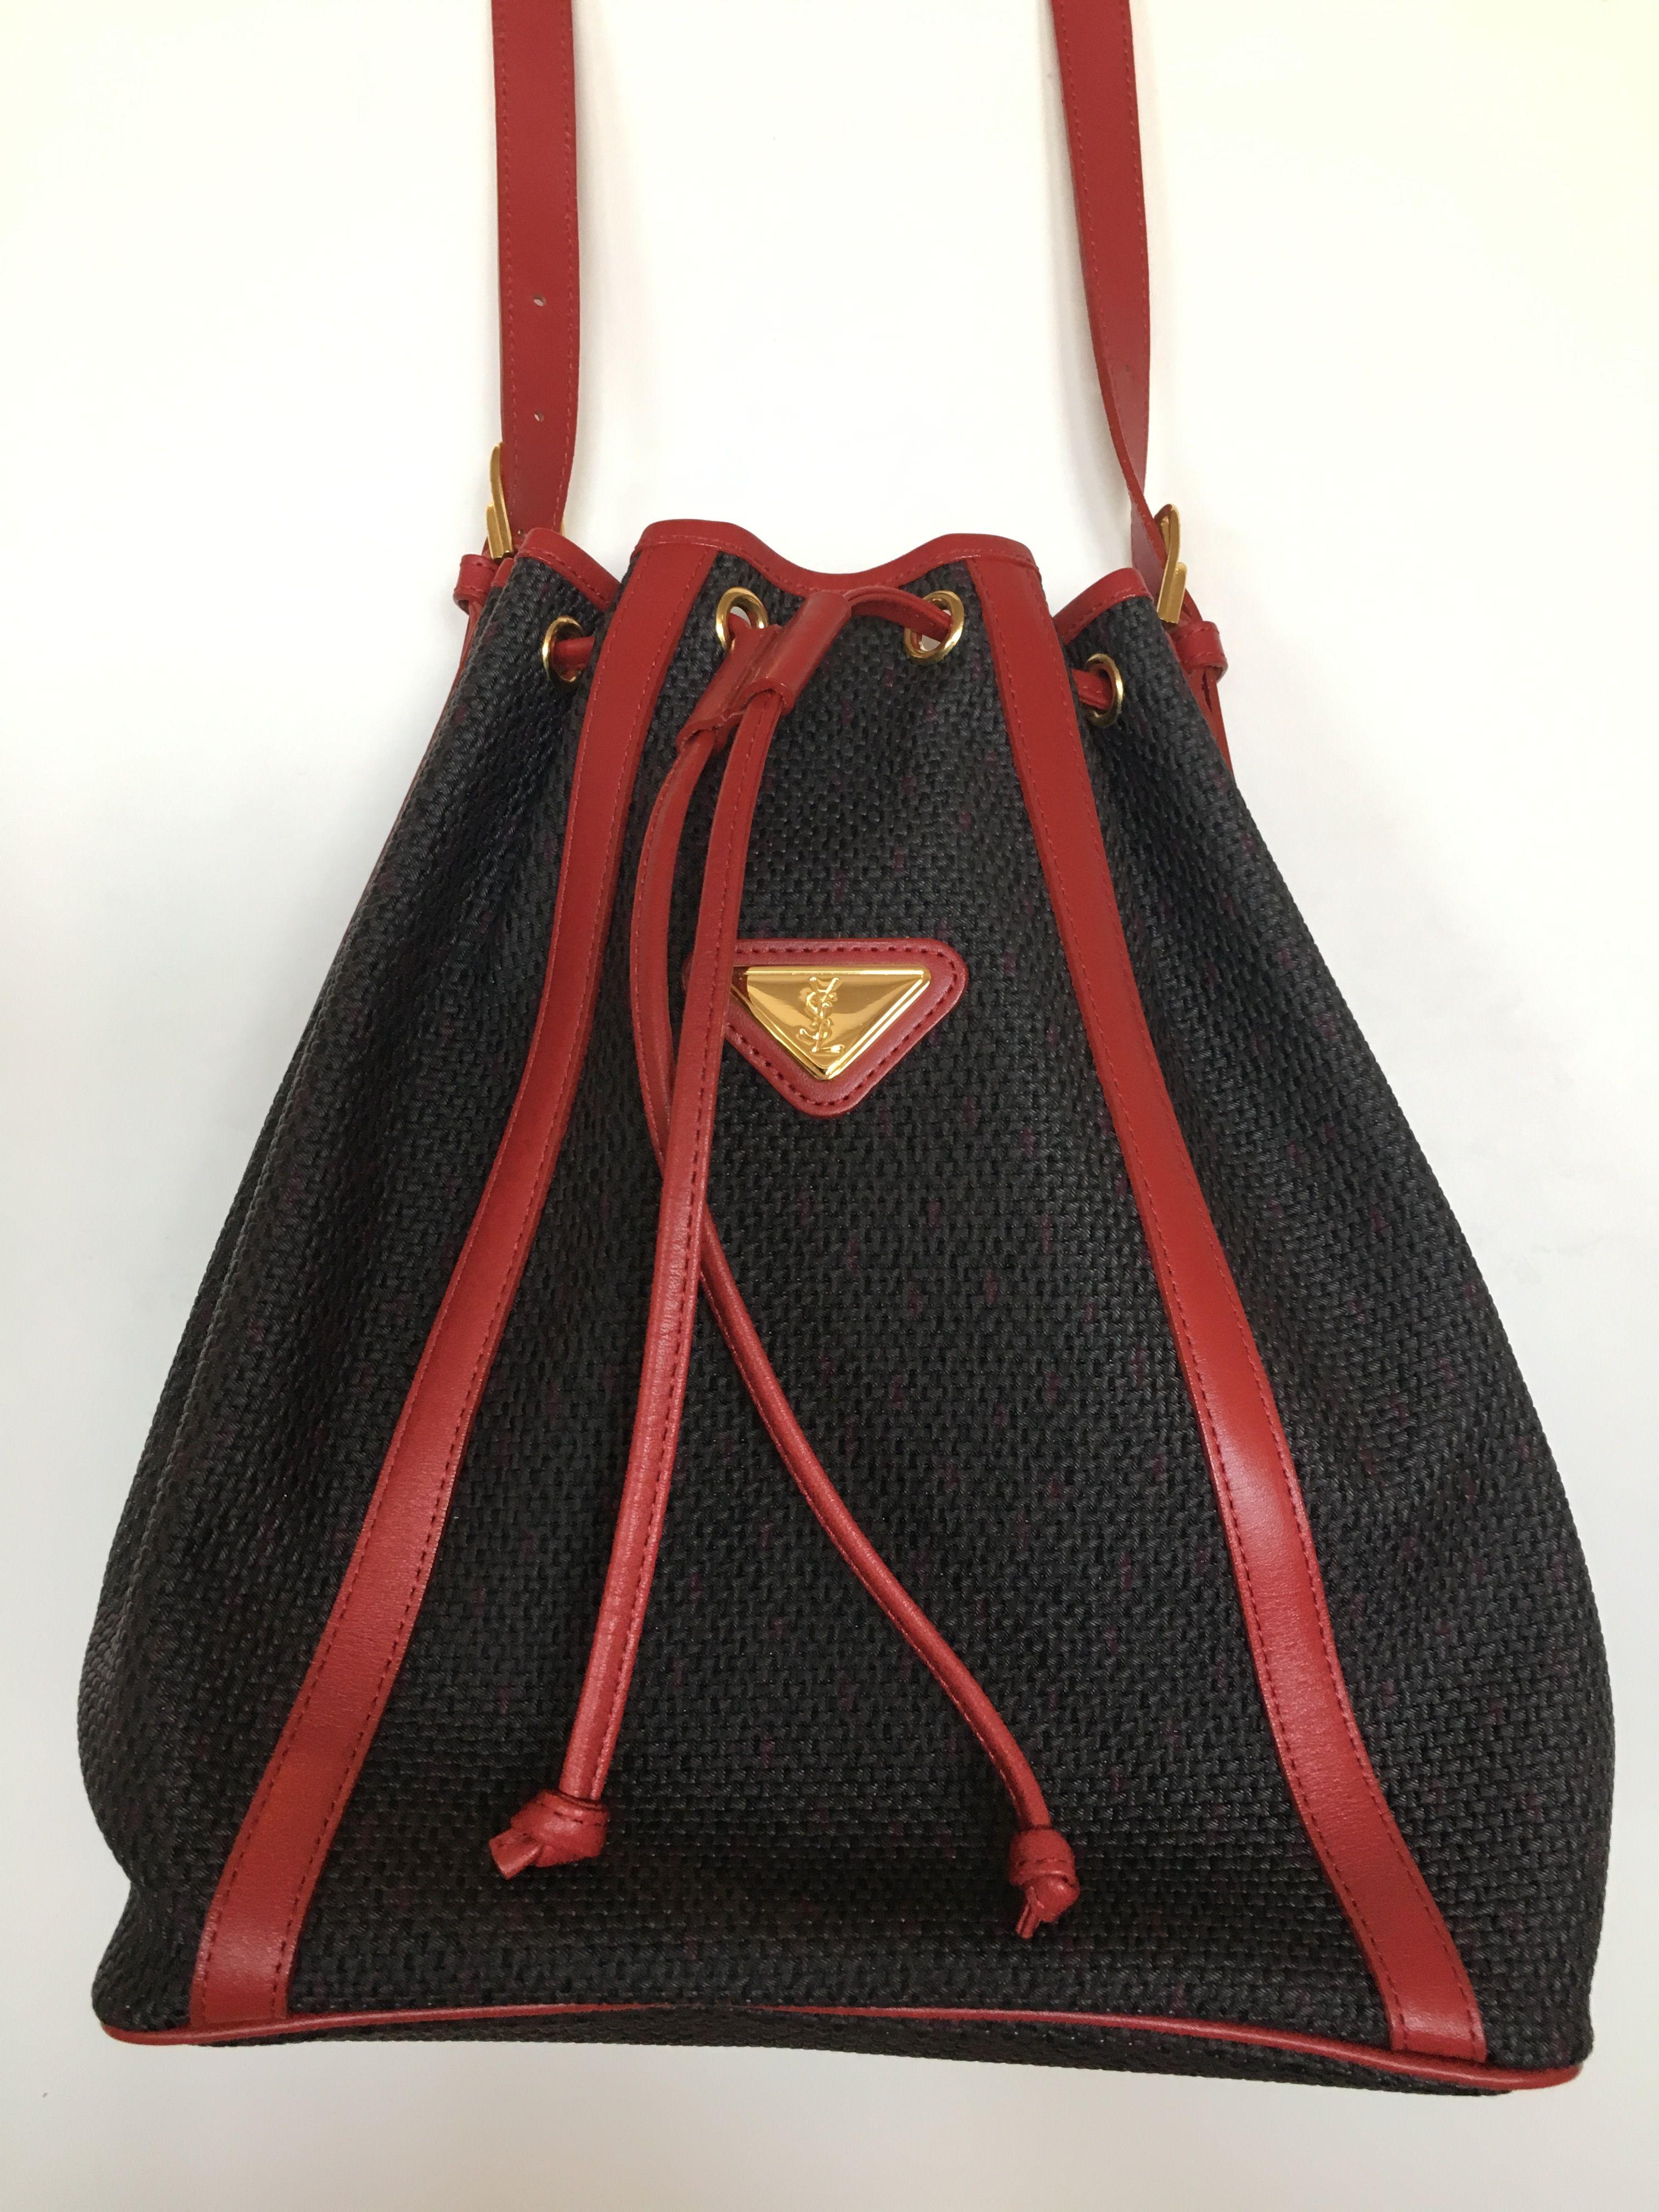 Yves Saint Laurent Japanese Vintage Bag Yves Saint Laurent Vintage Bags Saint Laurent